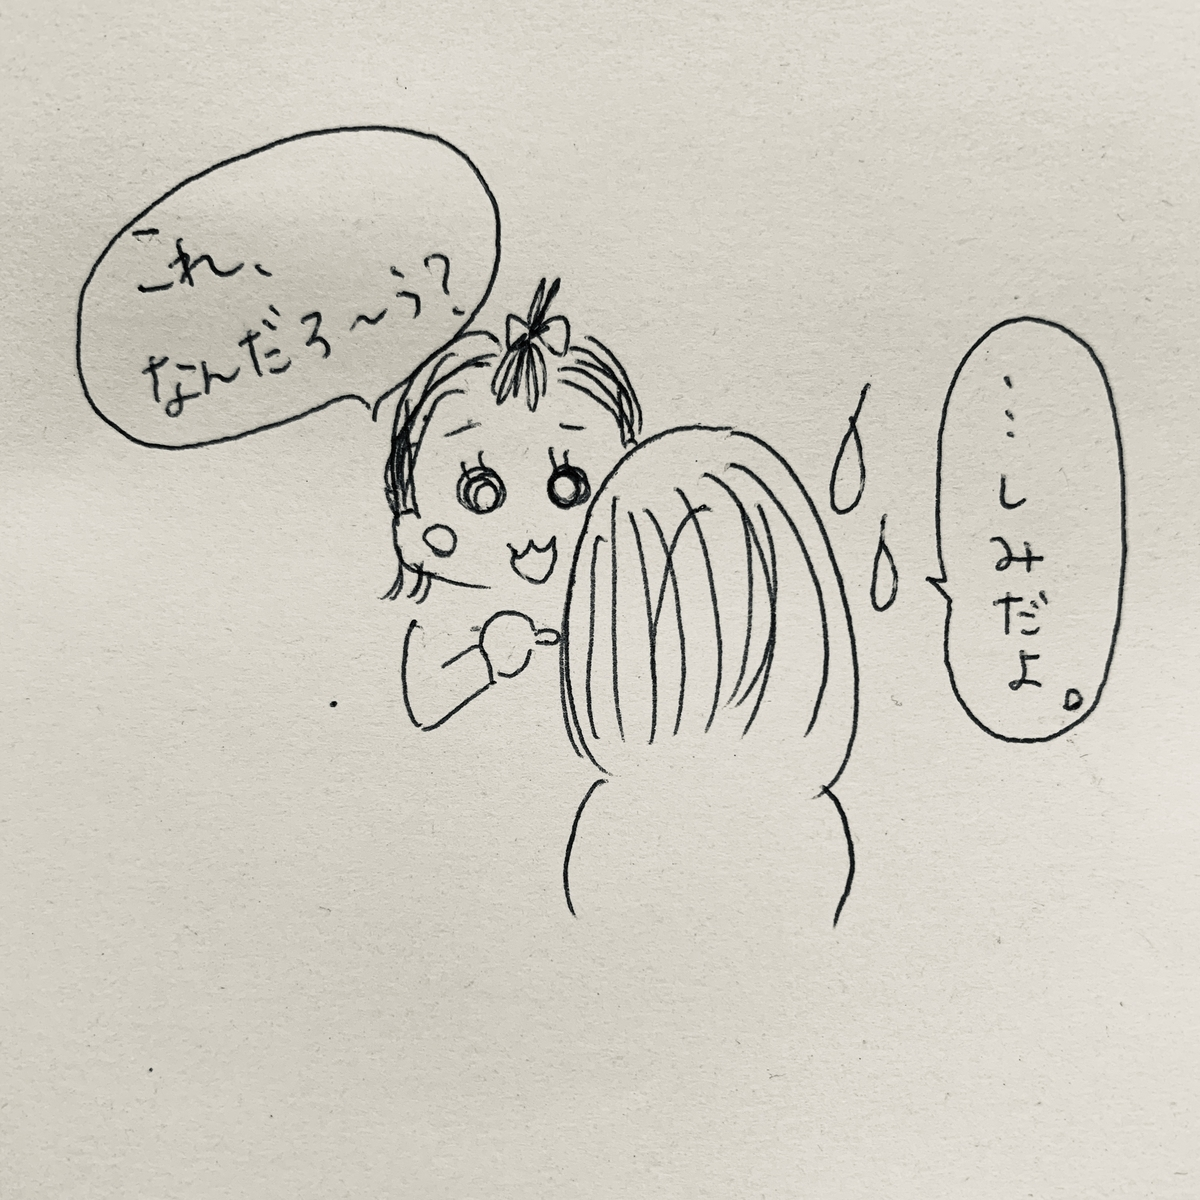 f:id:nananan0:20190419094357j:plain